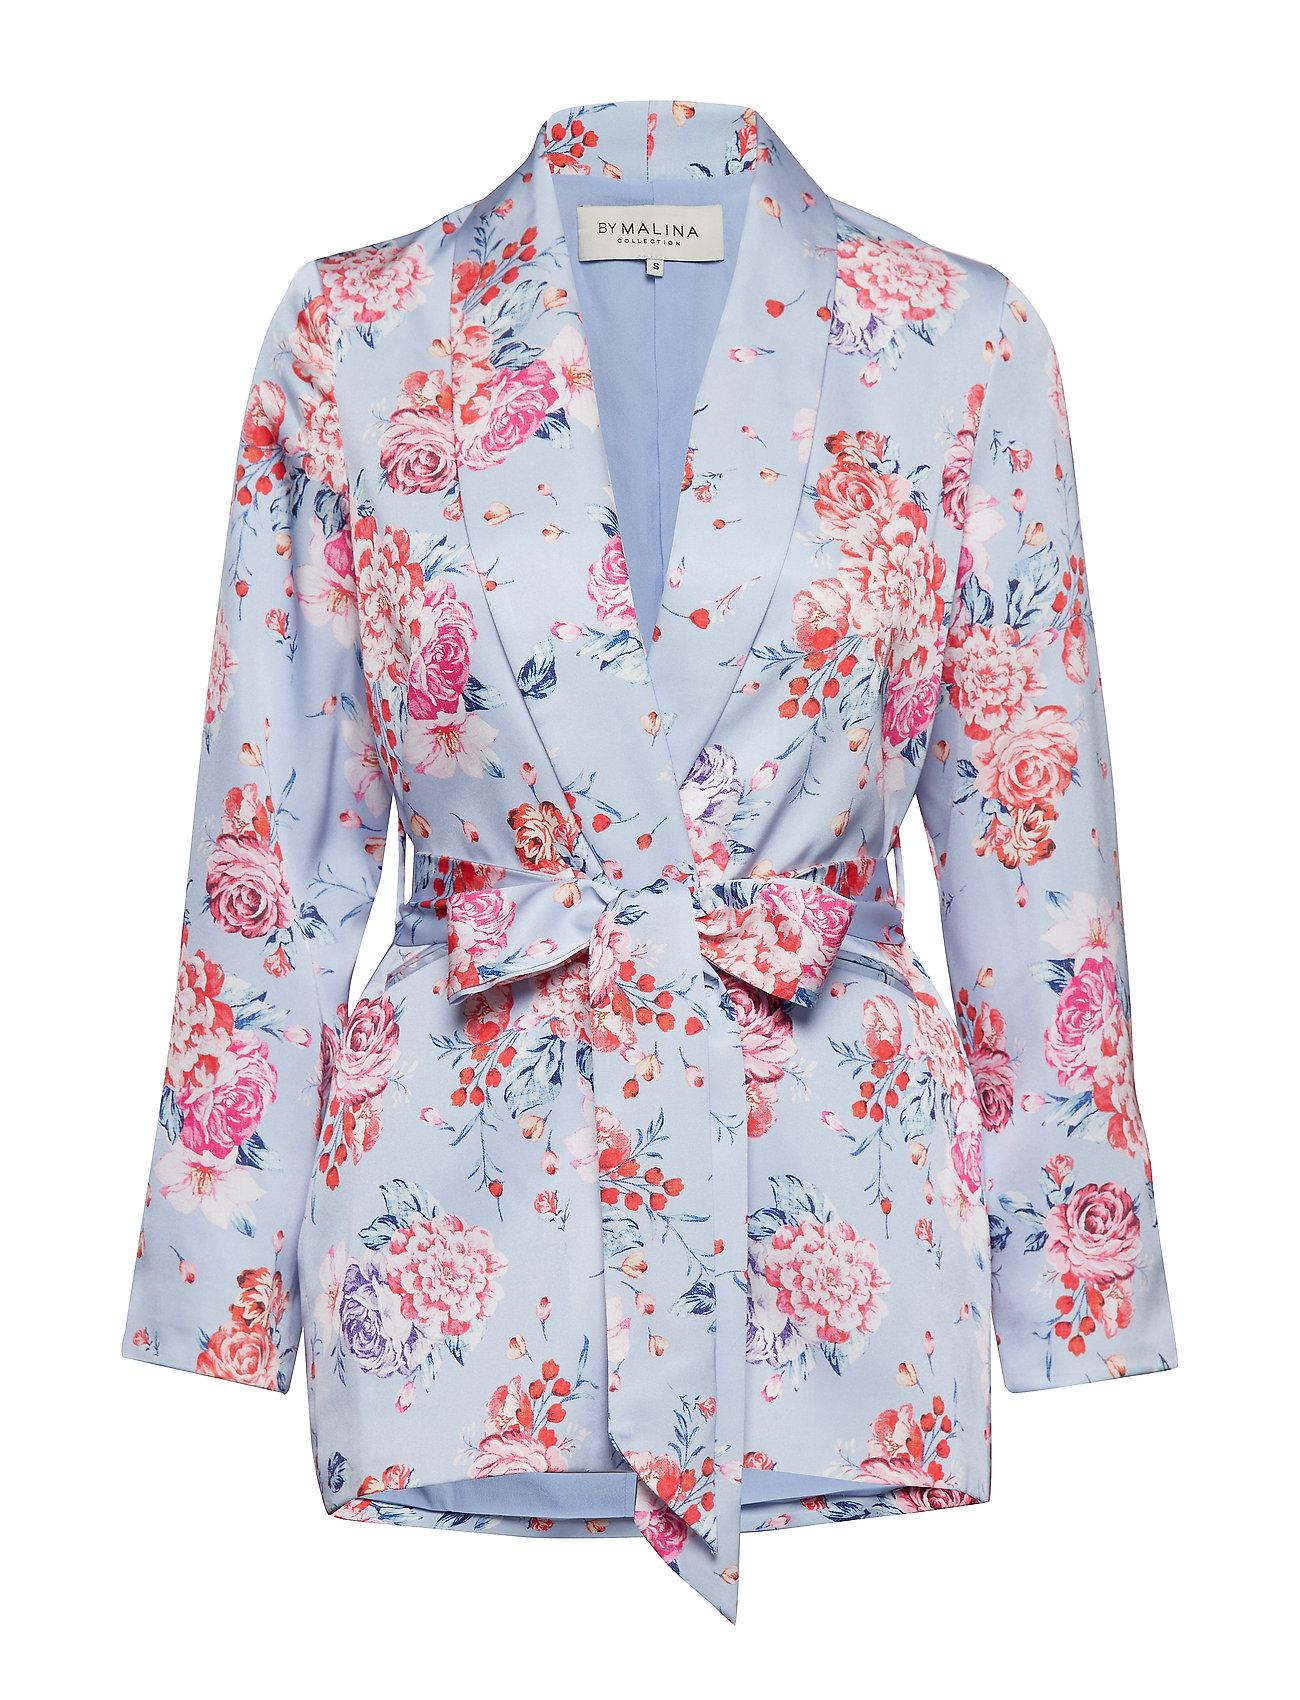 By Malina Day jacket - FLIRTY FLOWER